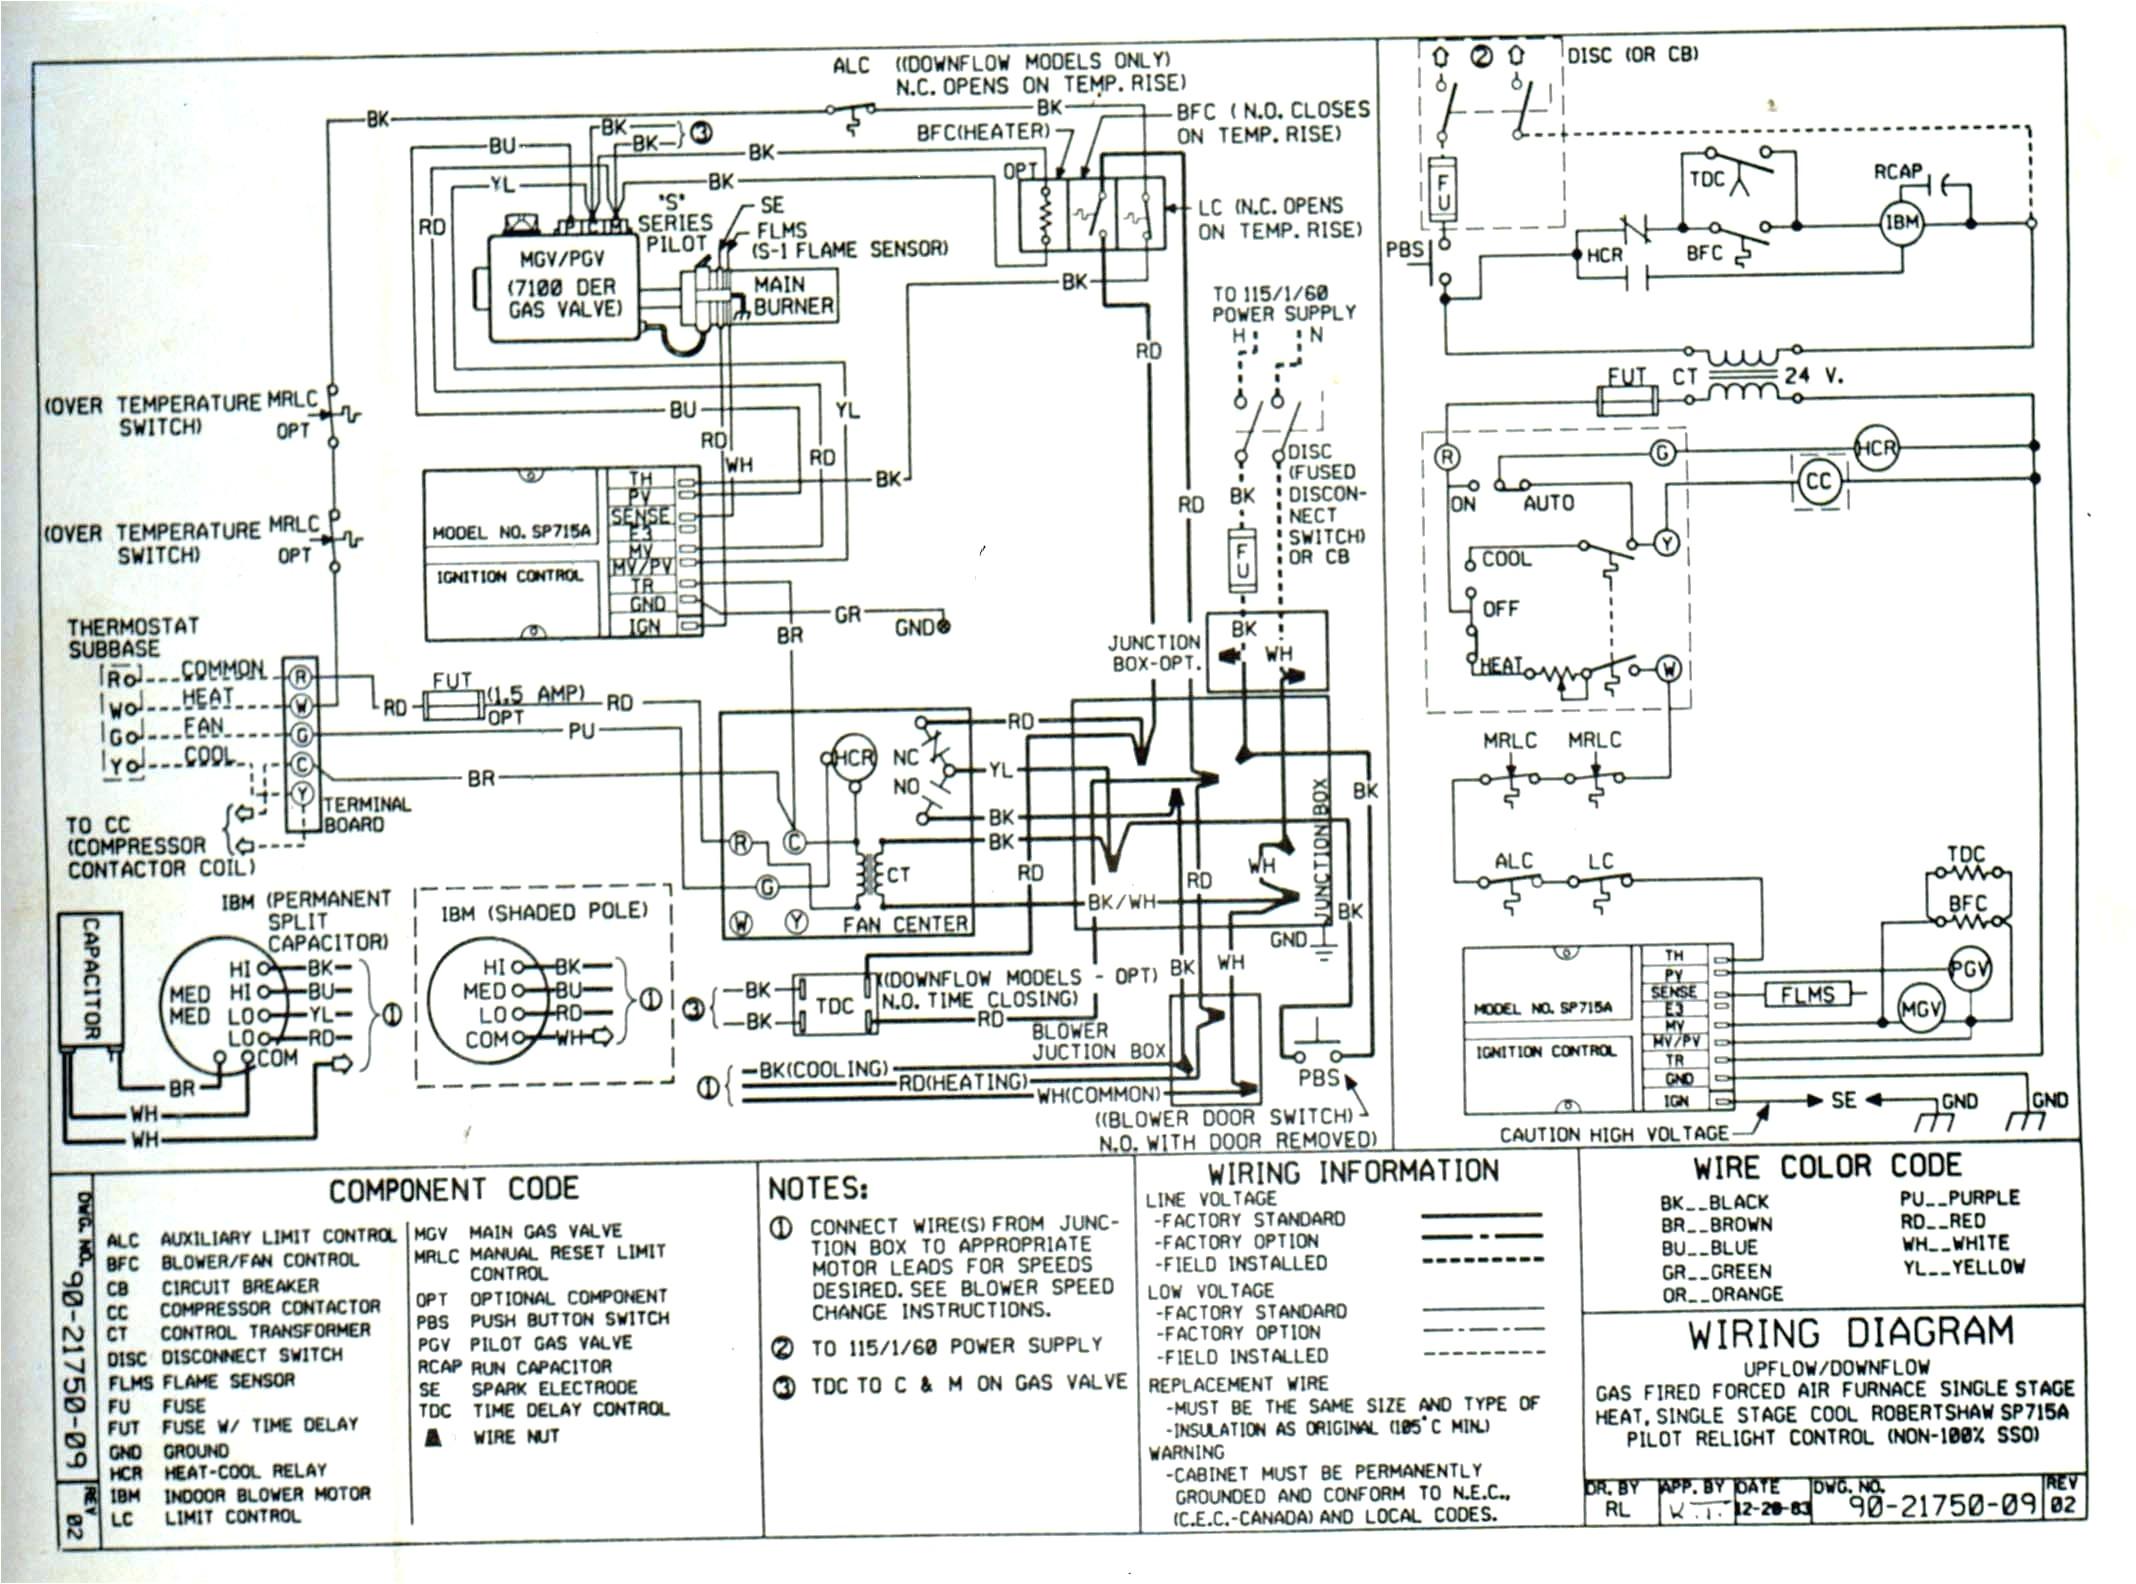 bodine electric dc motor wiring diagram bodine electric motor wiring diagram ac gear motor wiring diagram new wiring diagram electric motor 15n jpg